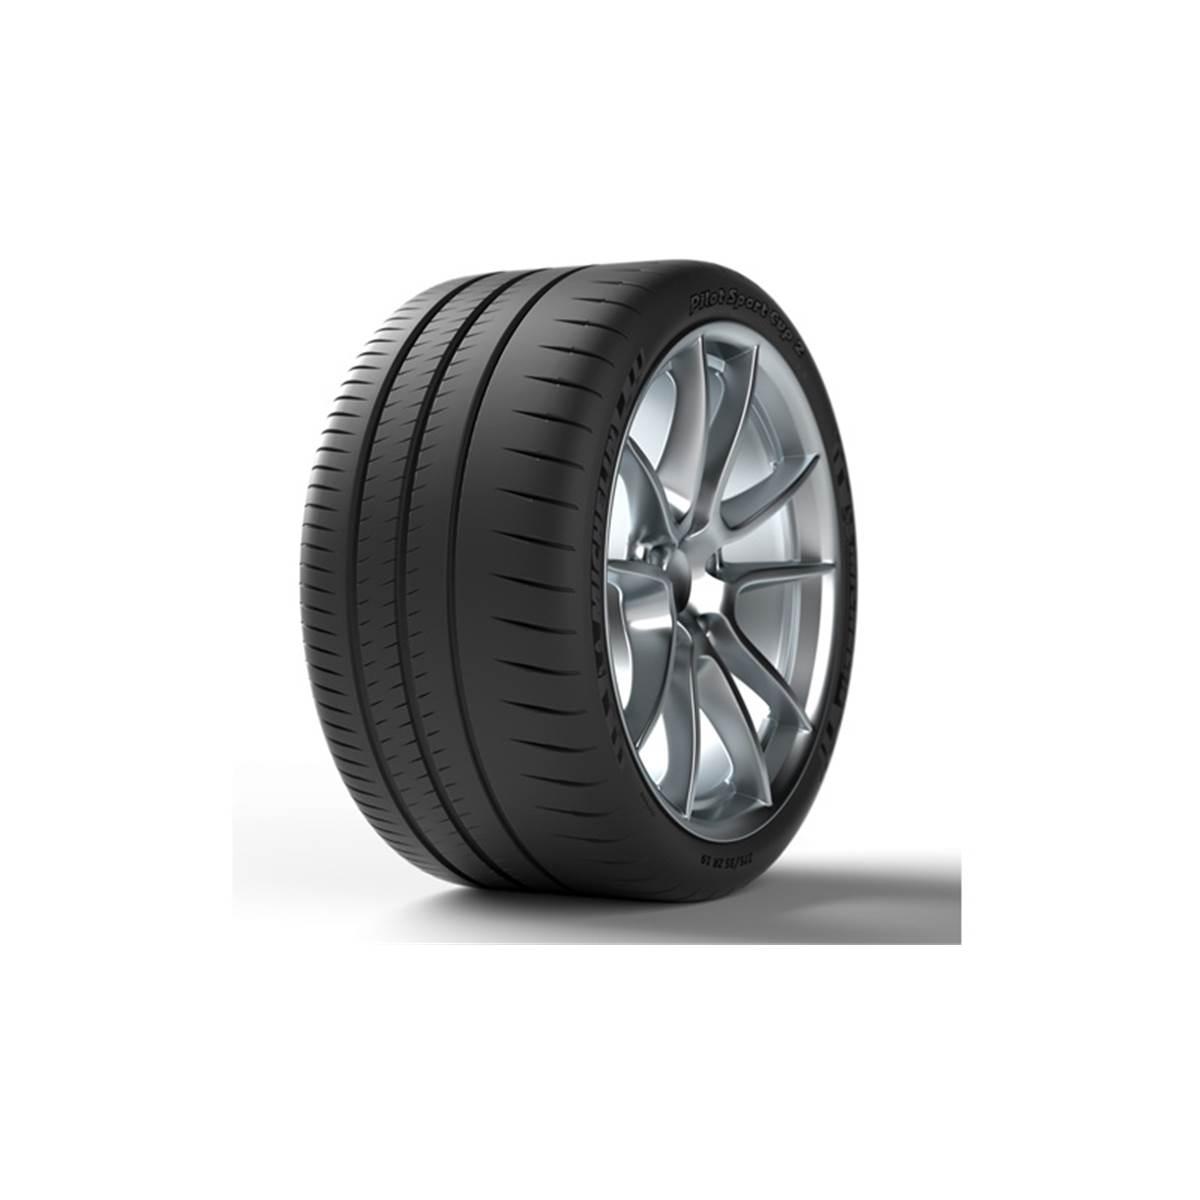 Pneu Michelin 235/40R18 95Y Pilot Sport Cup 2 XL